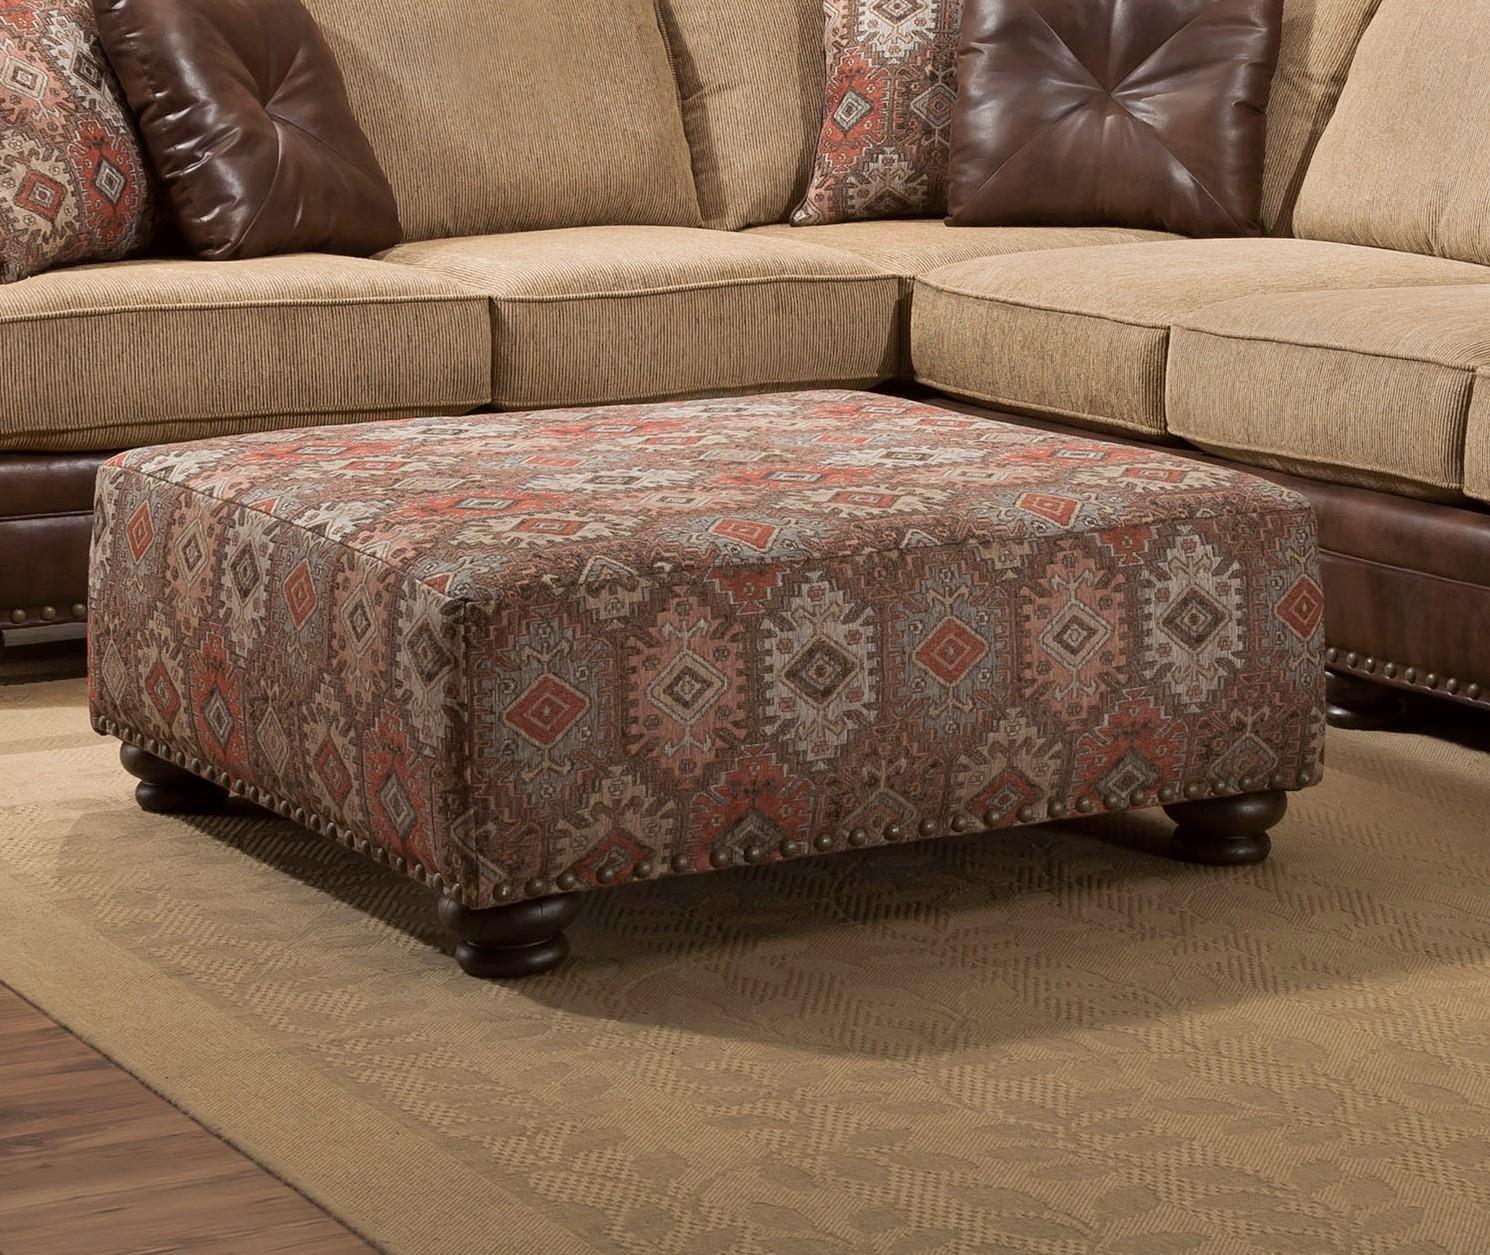 Furniture Furniture Stores In Lake Jackson Texas: Albany Sublime Treasure Texas Canyon Ottoman